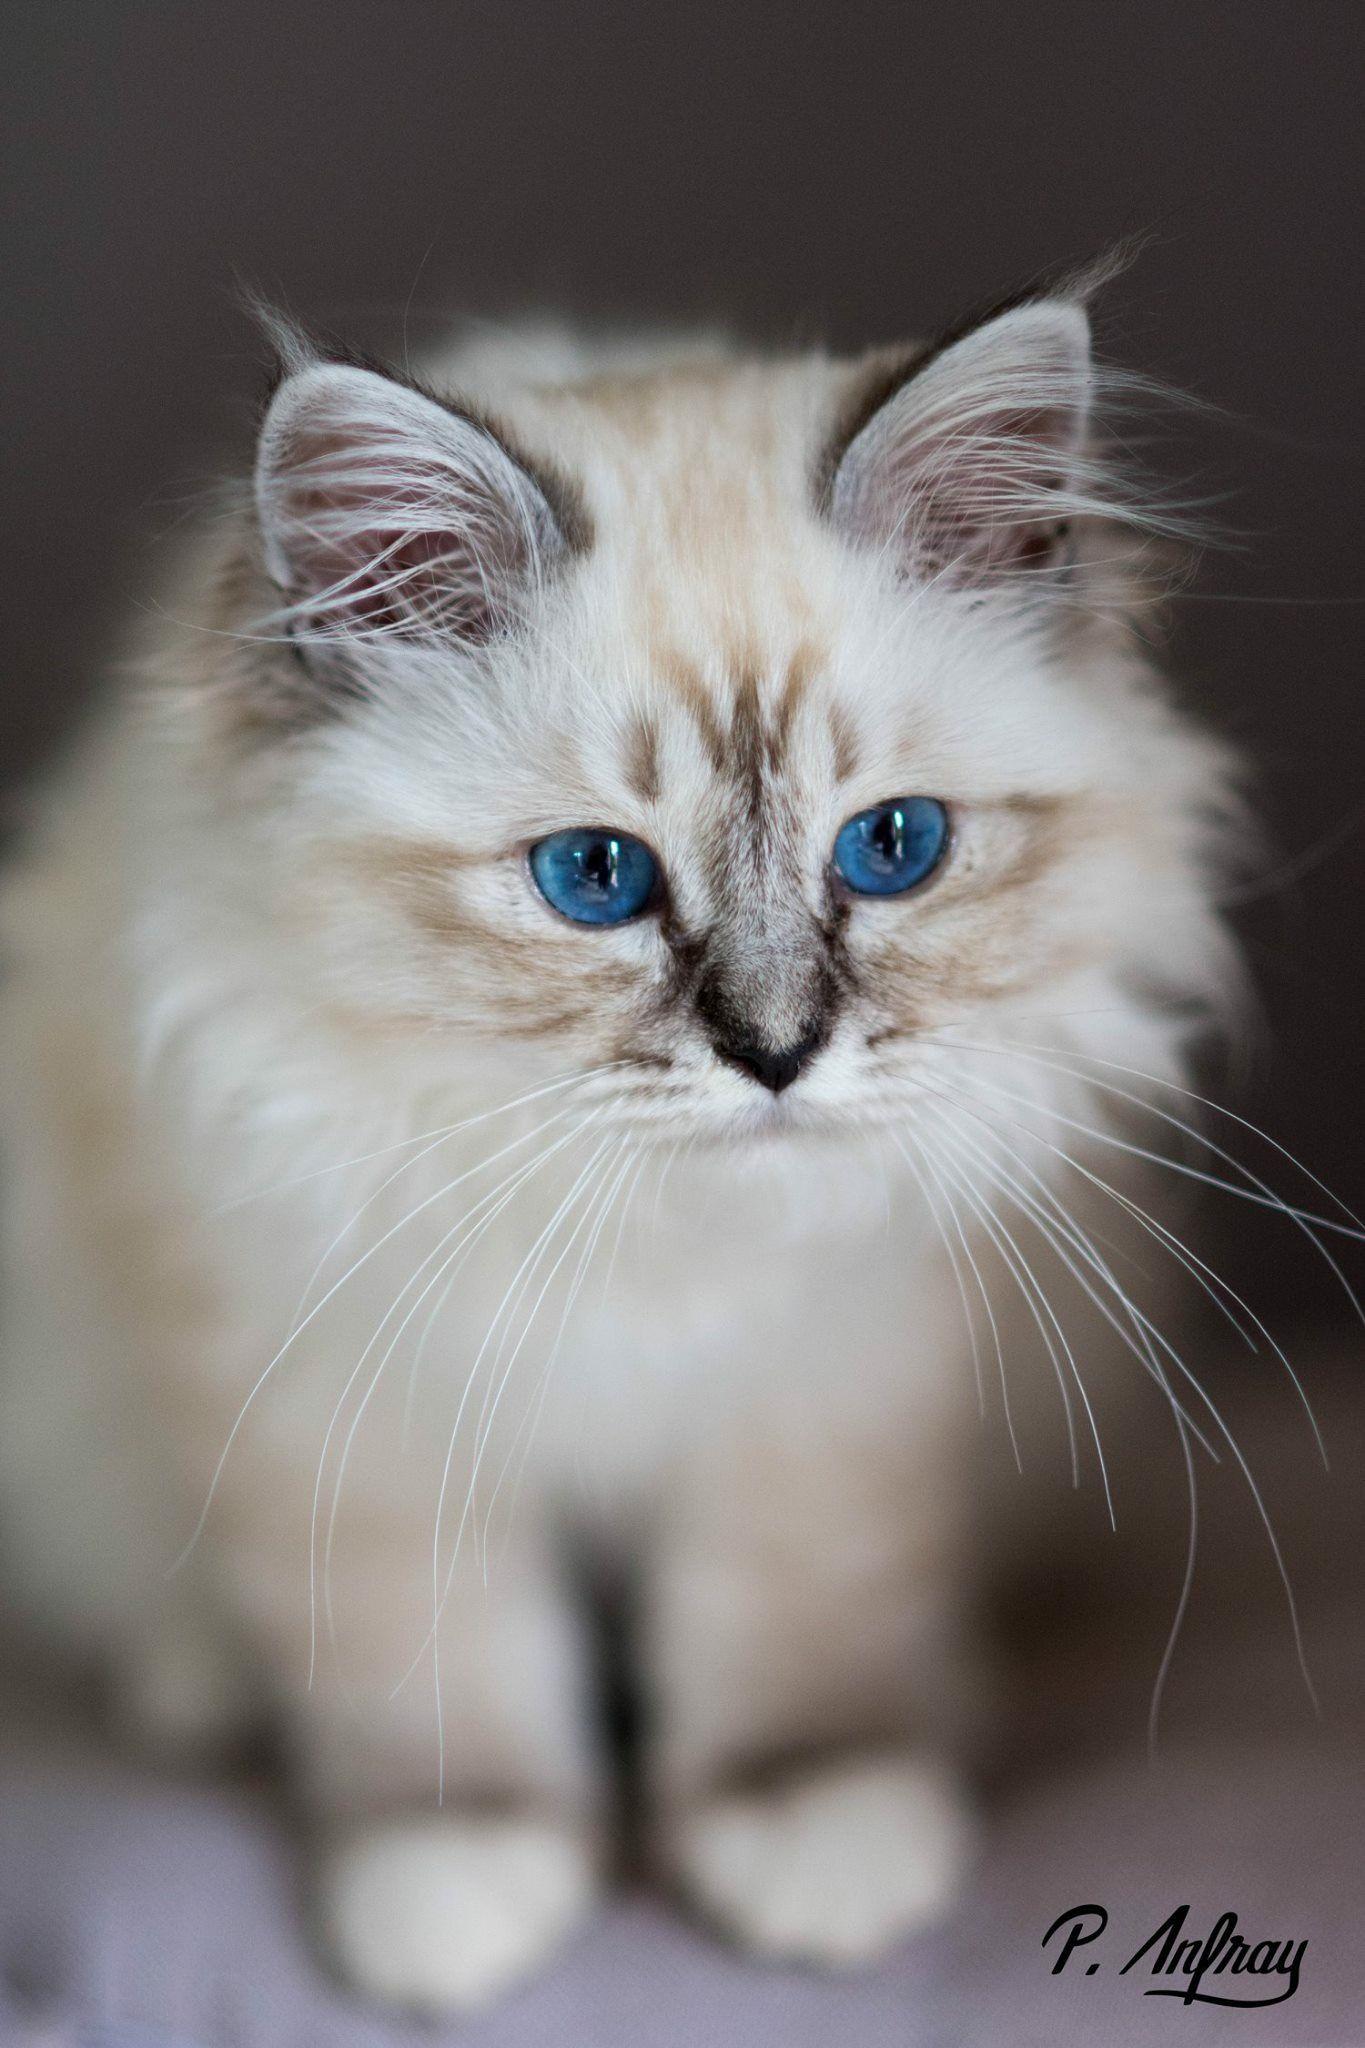 Love Cat Beautiful Kittens Kittens Cutest Kittens And Puppies